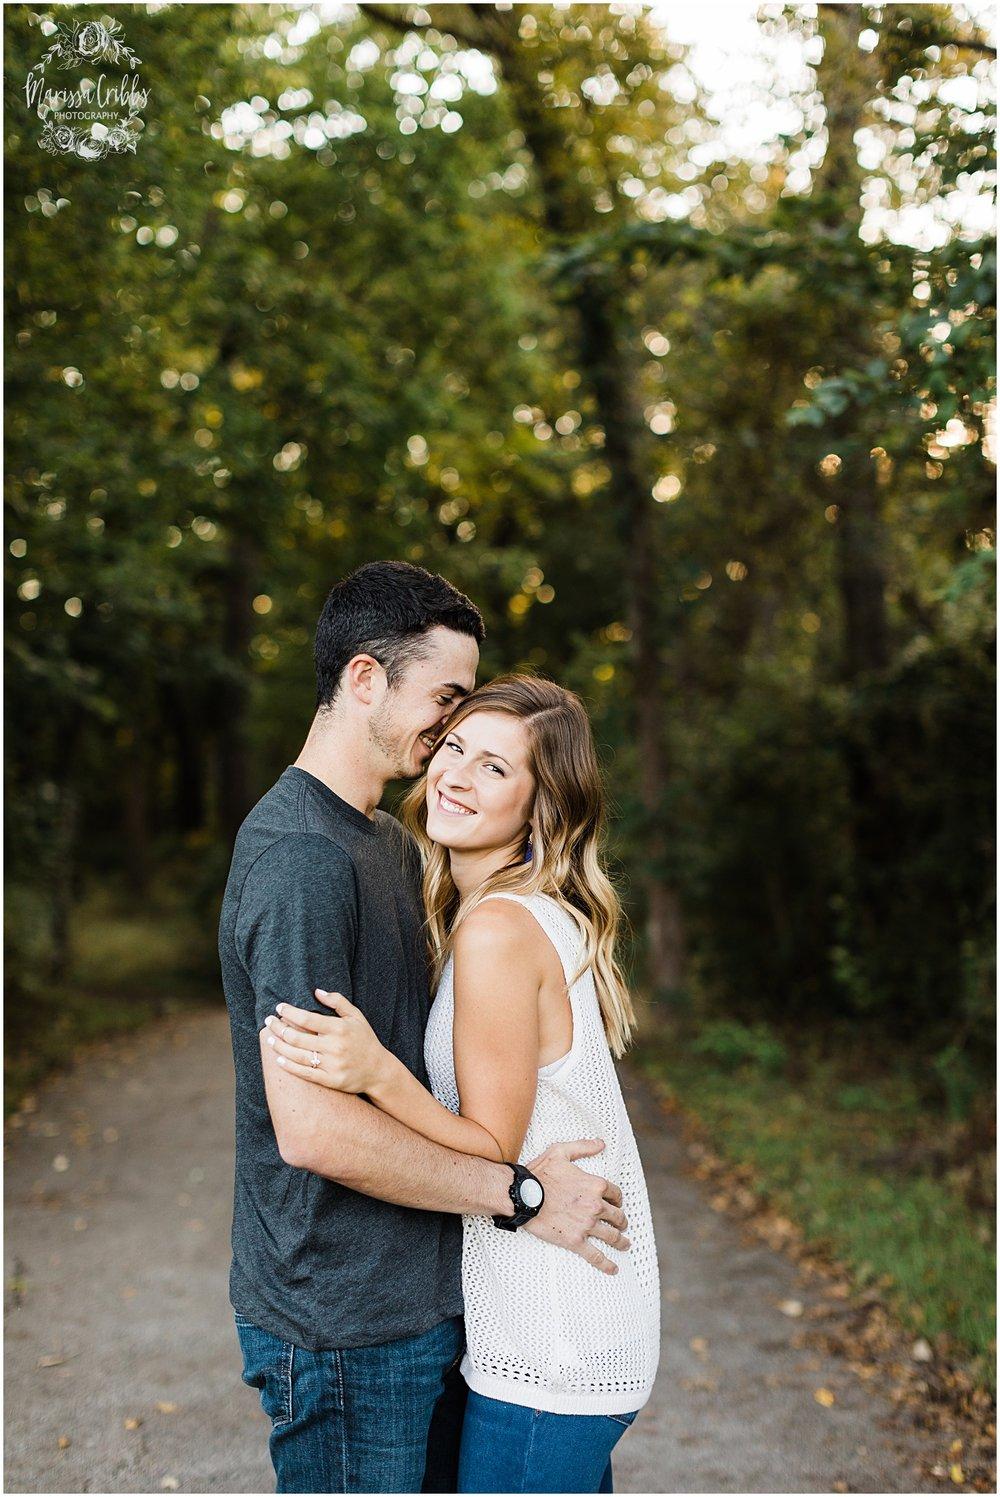 Leah & AJ Engagement | Marissa Cribbs Photography_6204.jpg